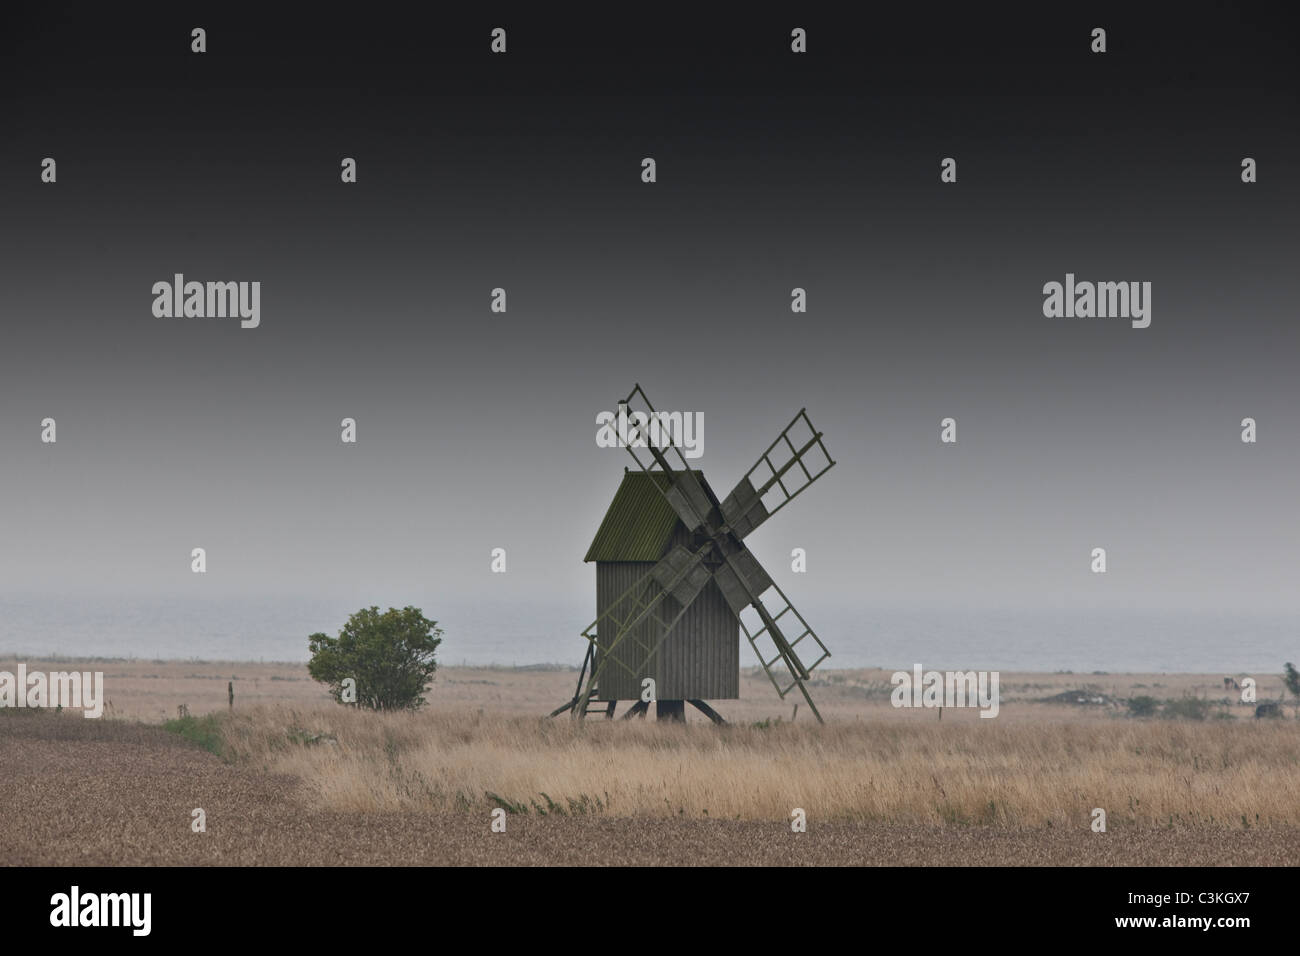 Old windmill on farm - Stock Image